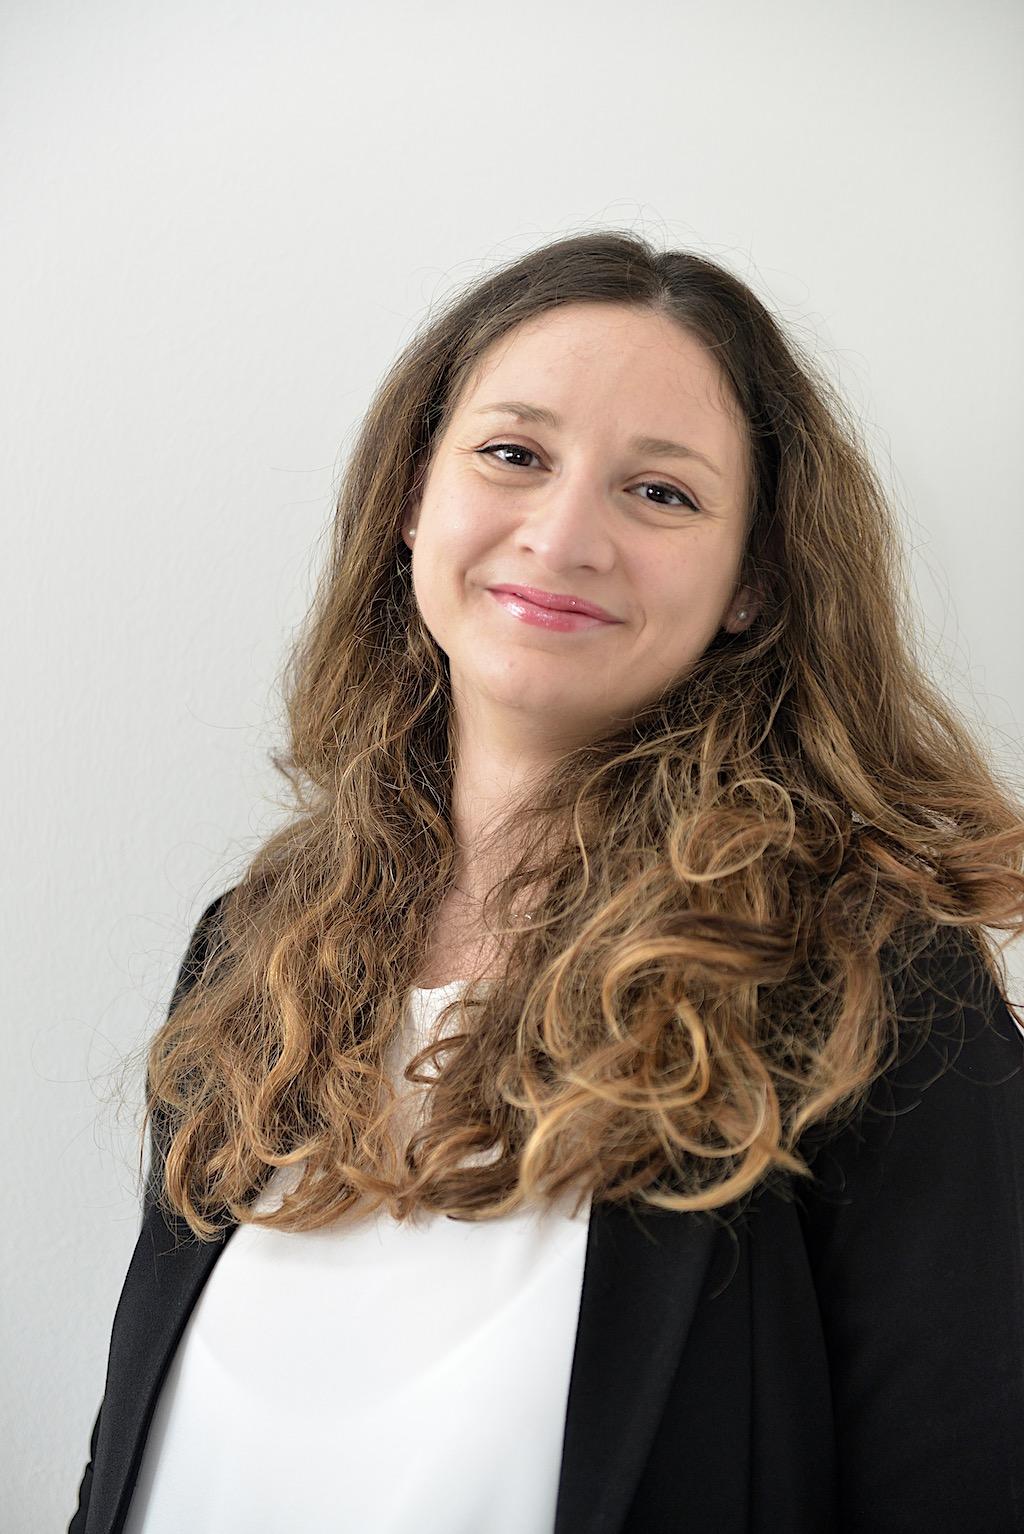 Luciana Conese